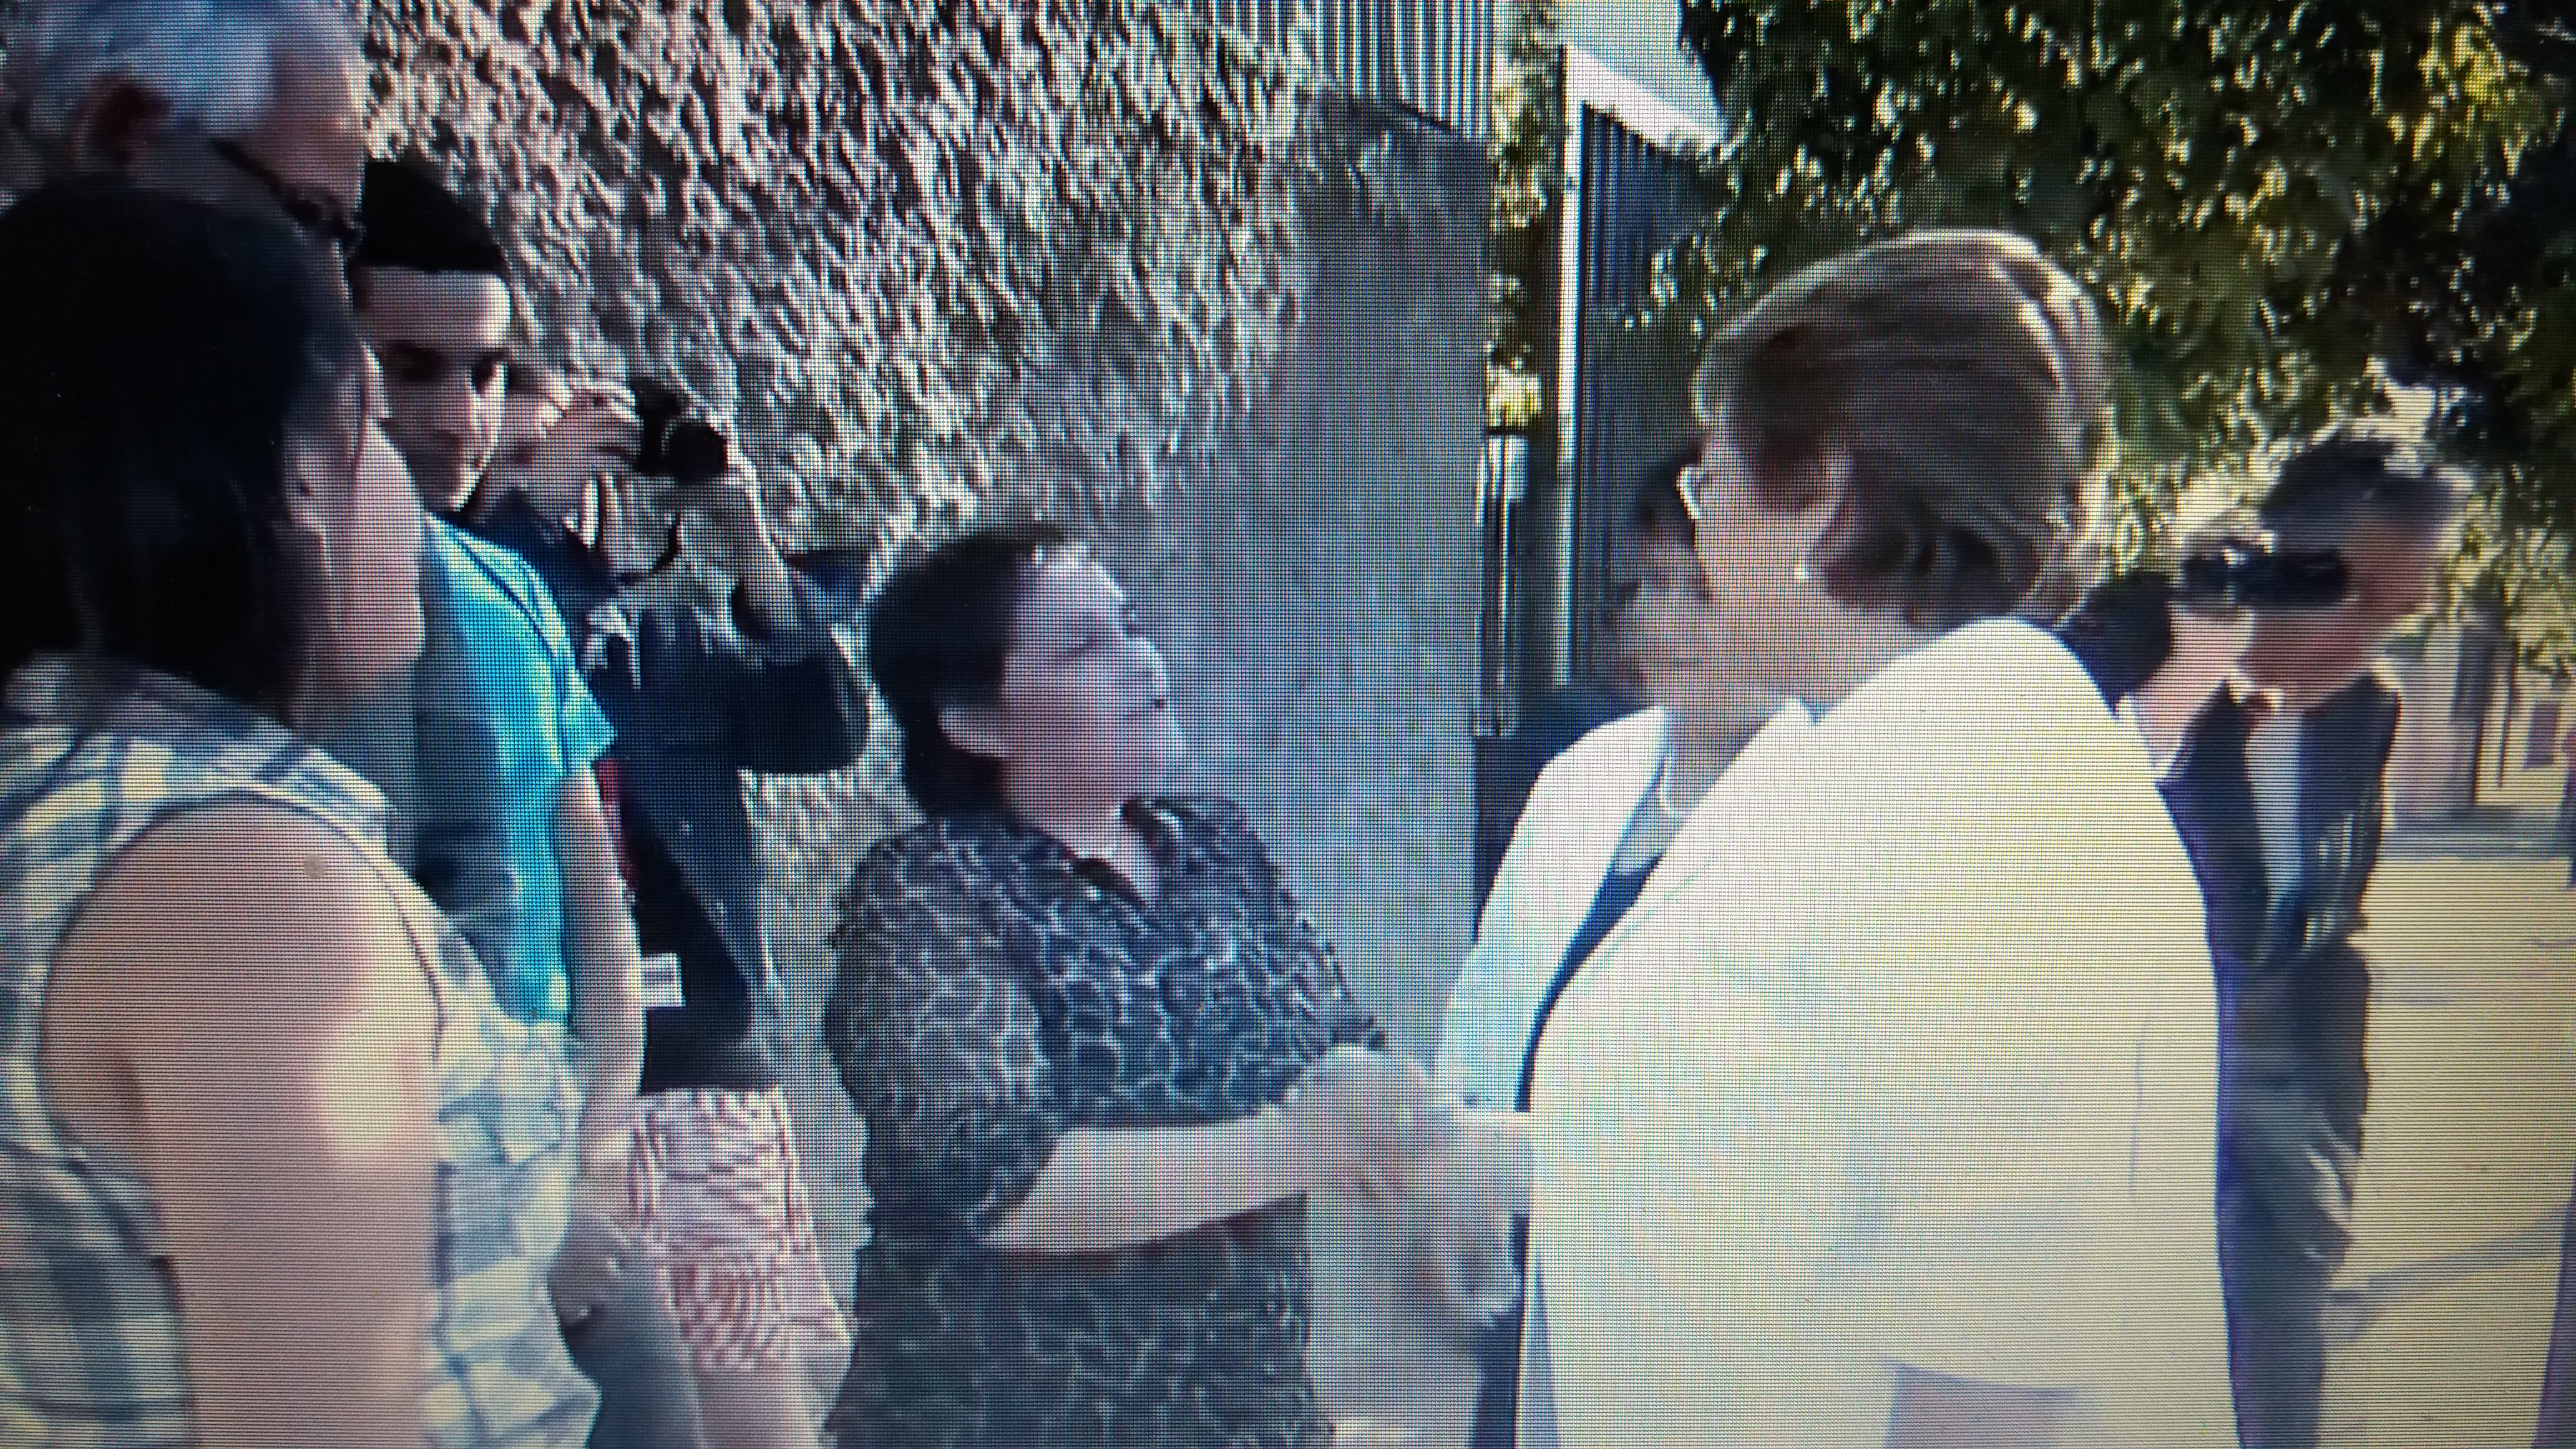 Presidenta Bachelet visita a alumna que accede a gratuidad